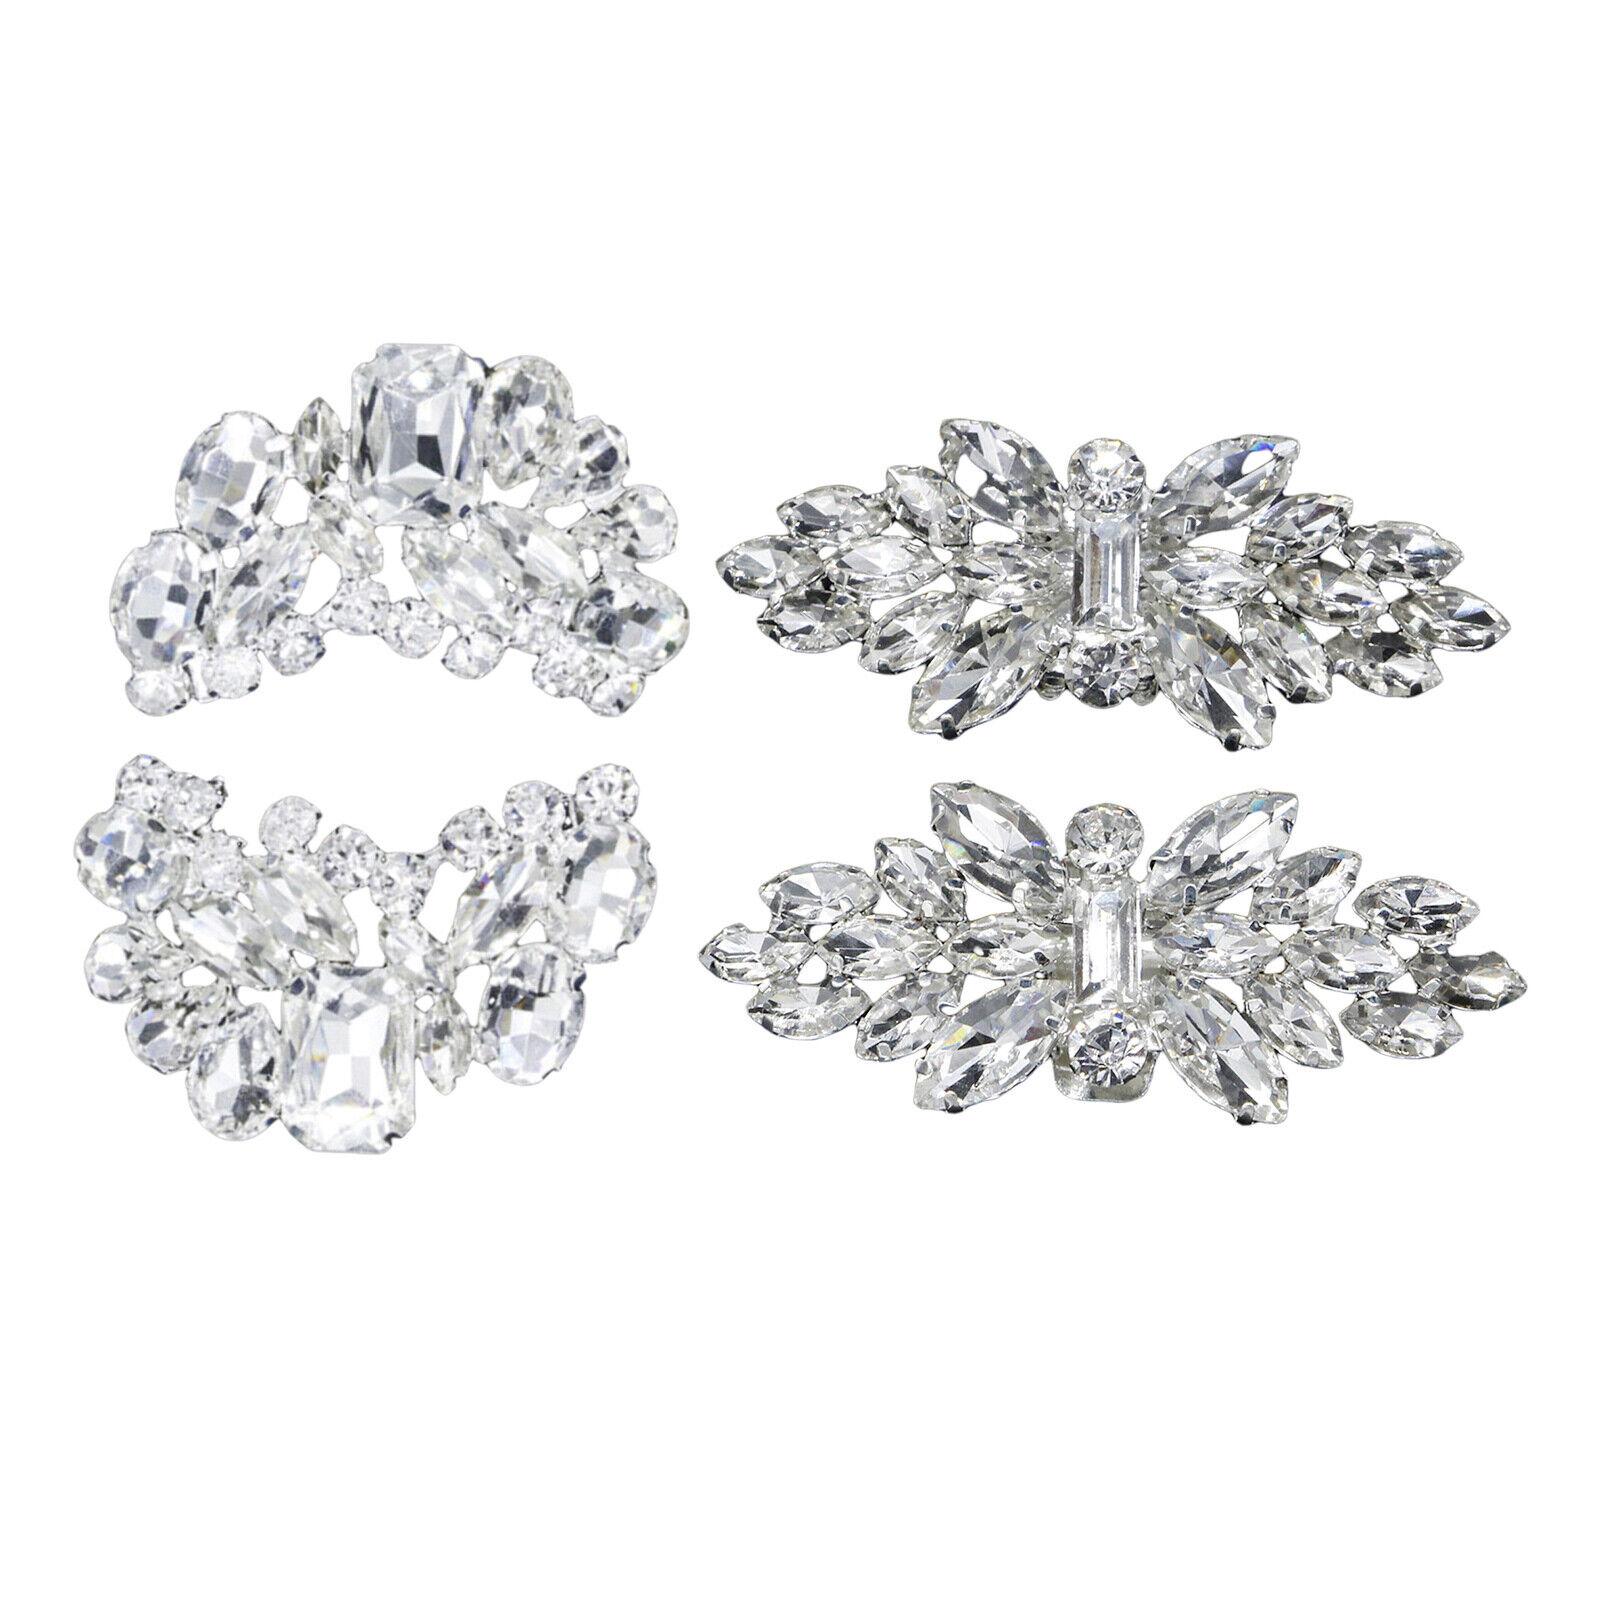 Pair Rhinestone Crystal Shoe Clips Women Wedding Boots Charms Jewelry Decor